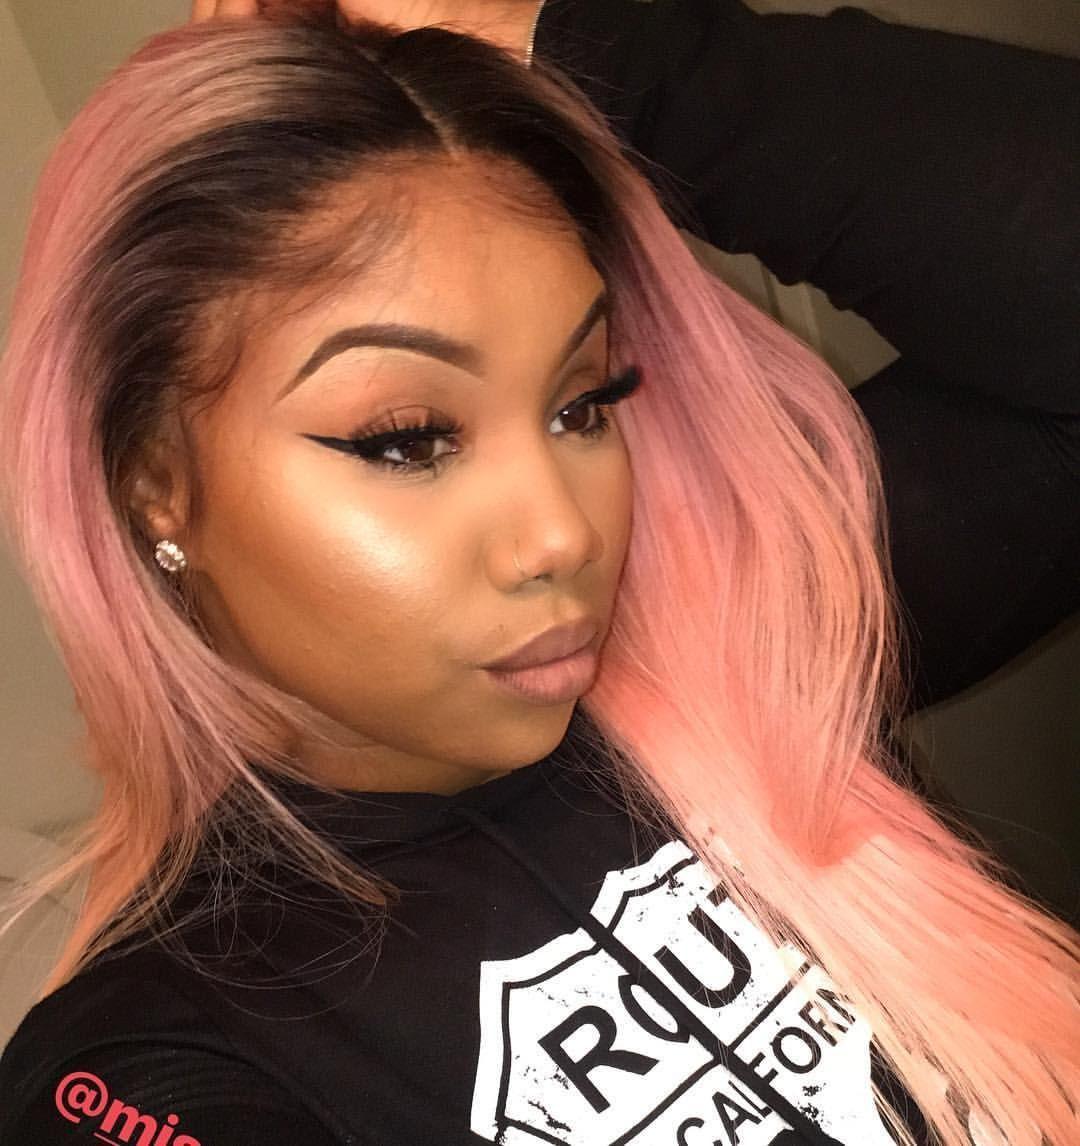 Pink Hair Black Girl Pink Hair In 2020 Black Girl Pink Hair Pink Hair Streaks Pink Hair Highlights